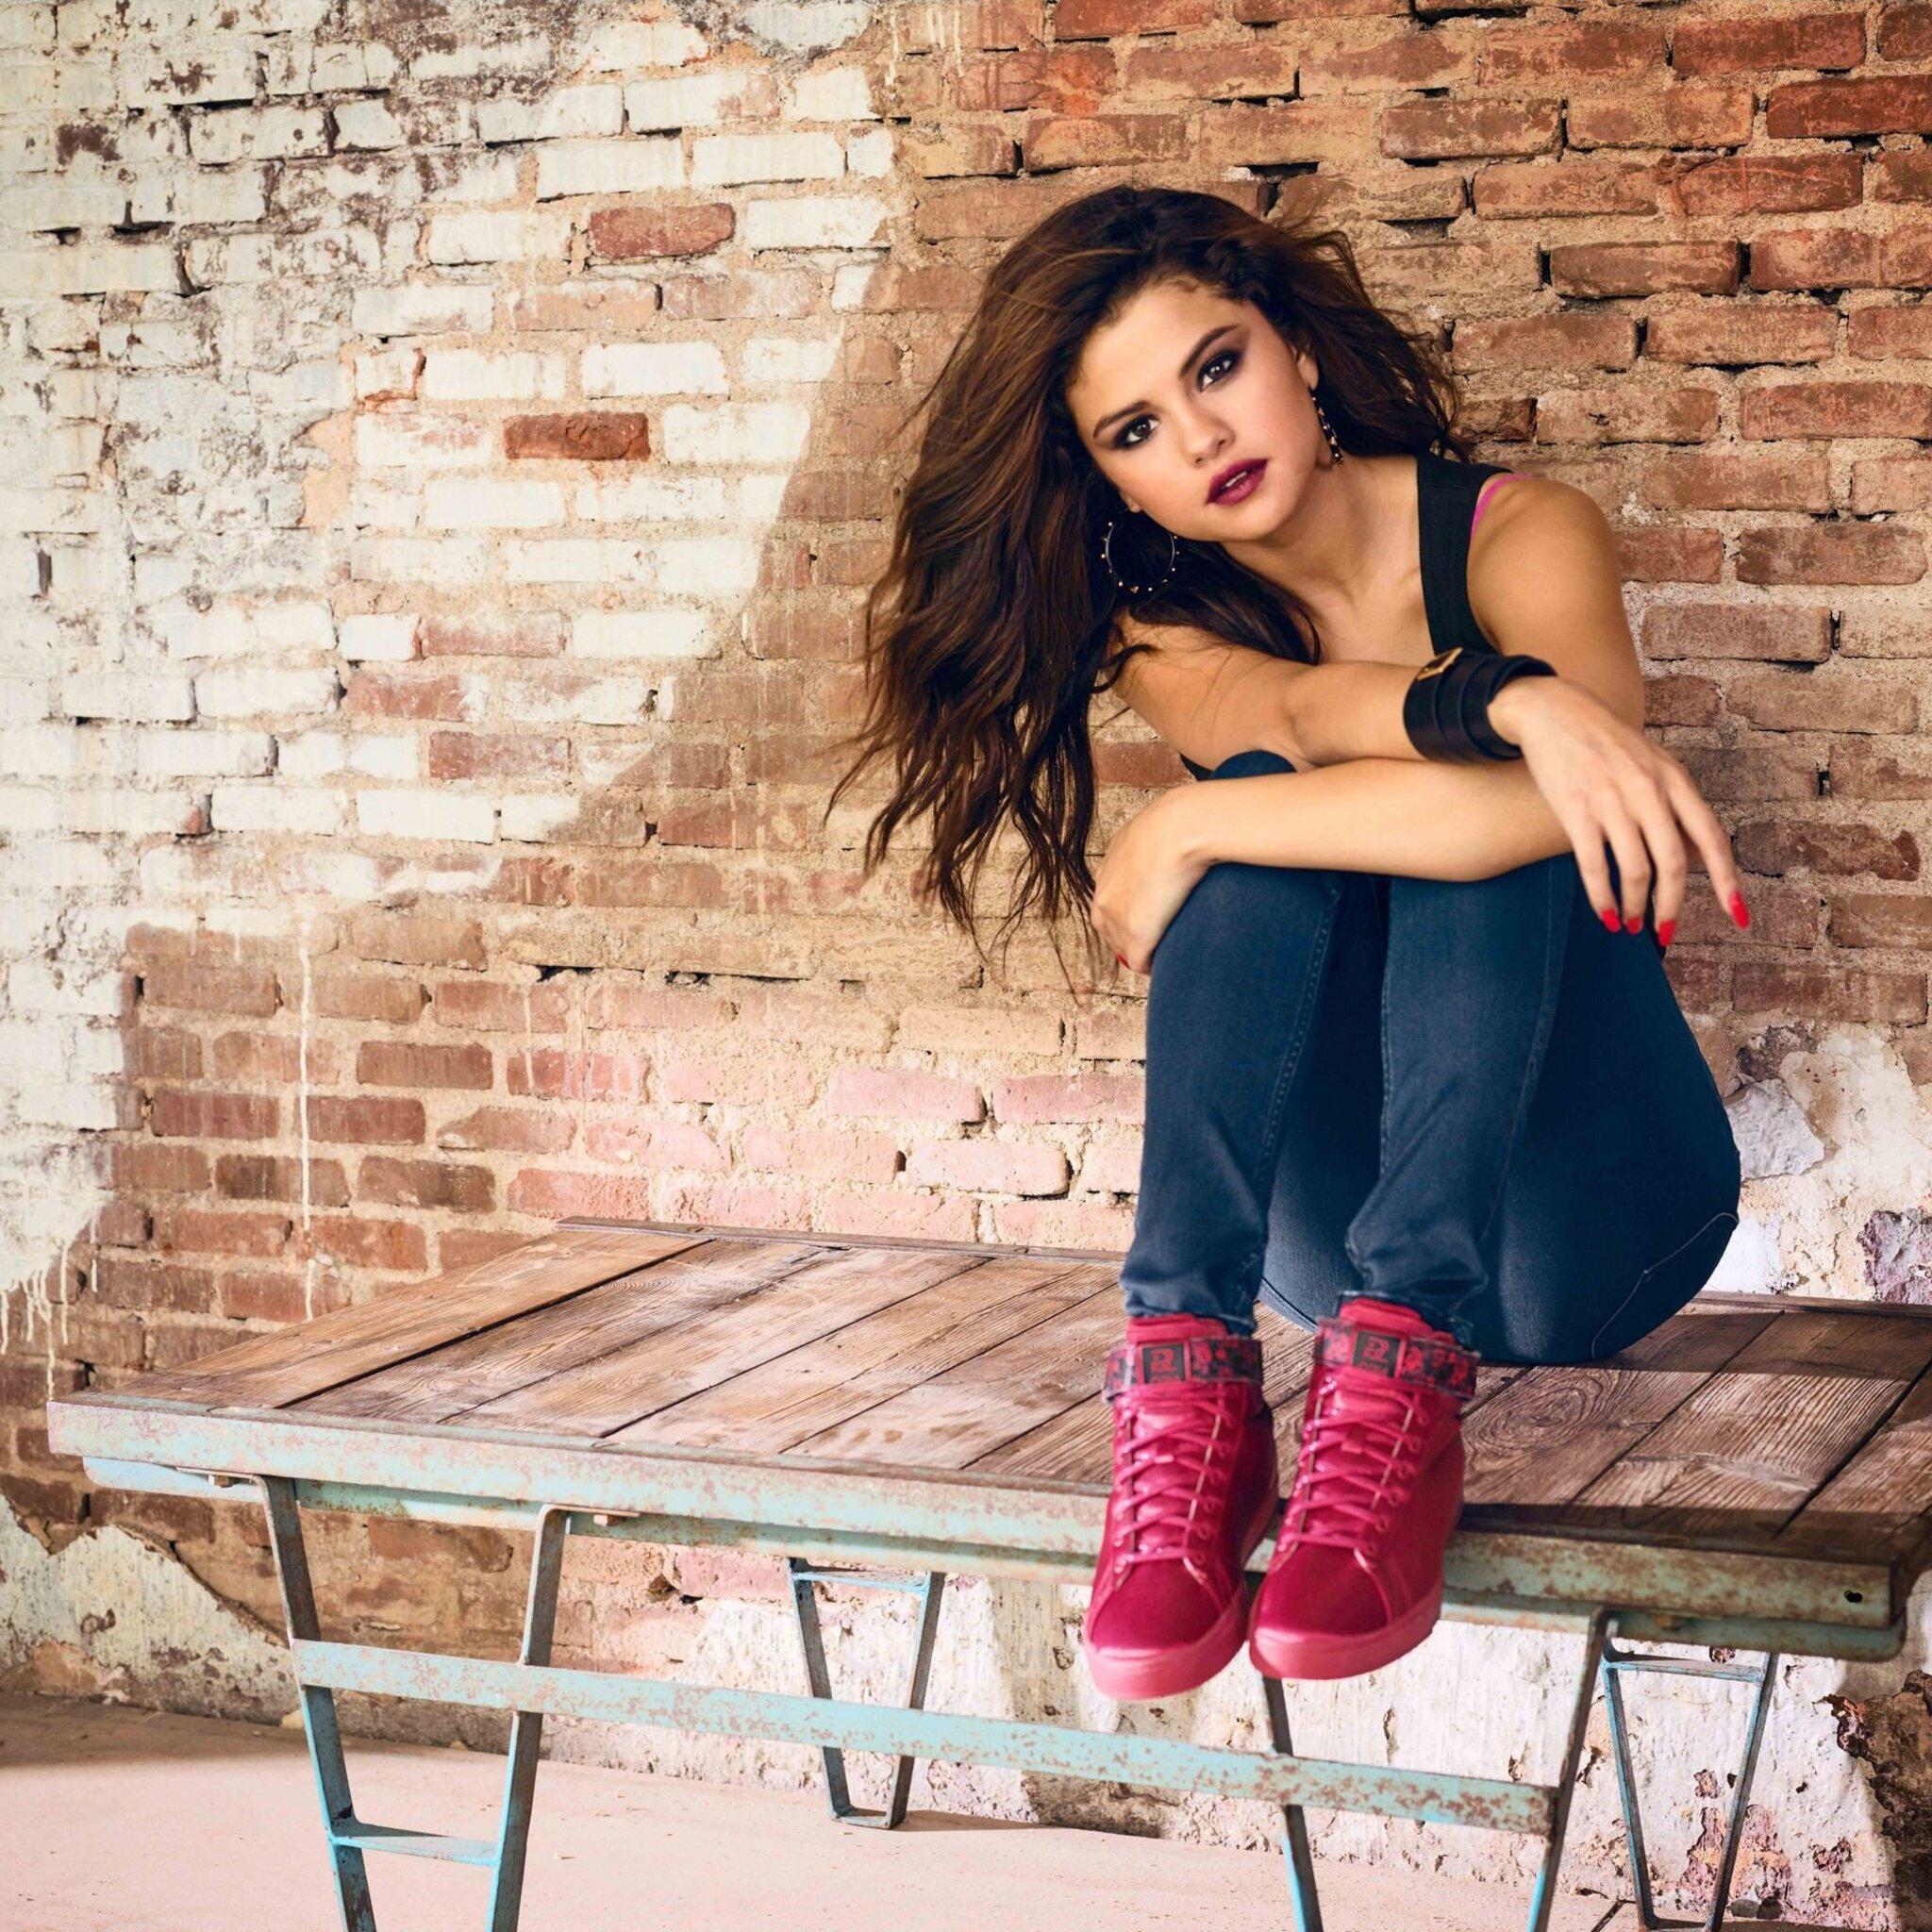 2048x2048 Selena Gomez Photoshoot 2016 Ipad Air HD 4k